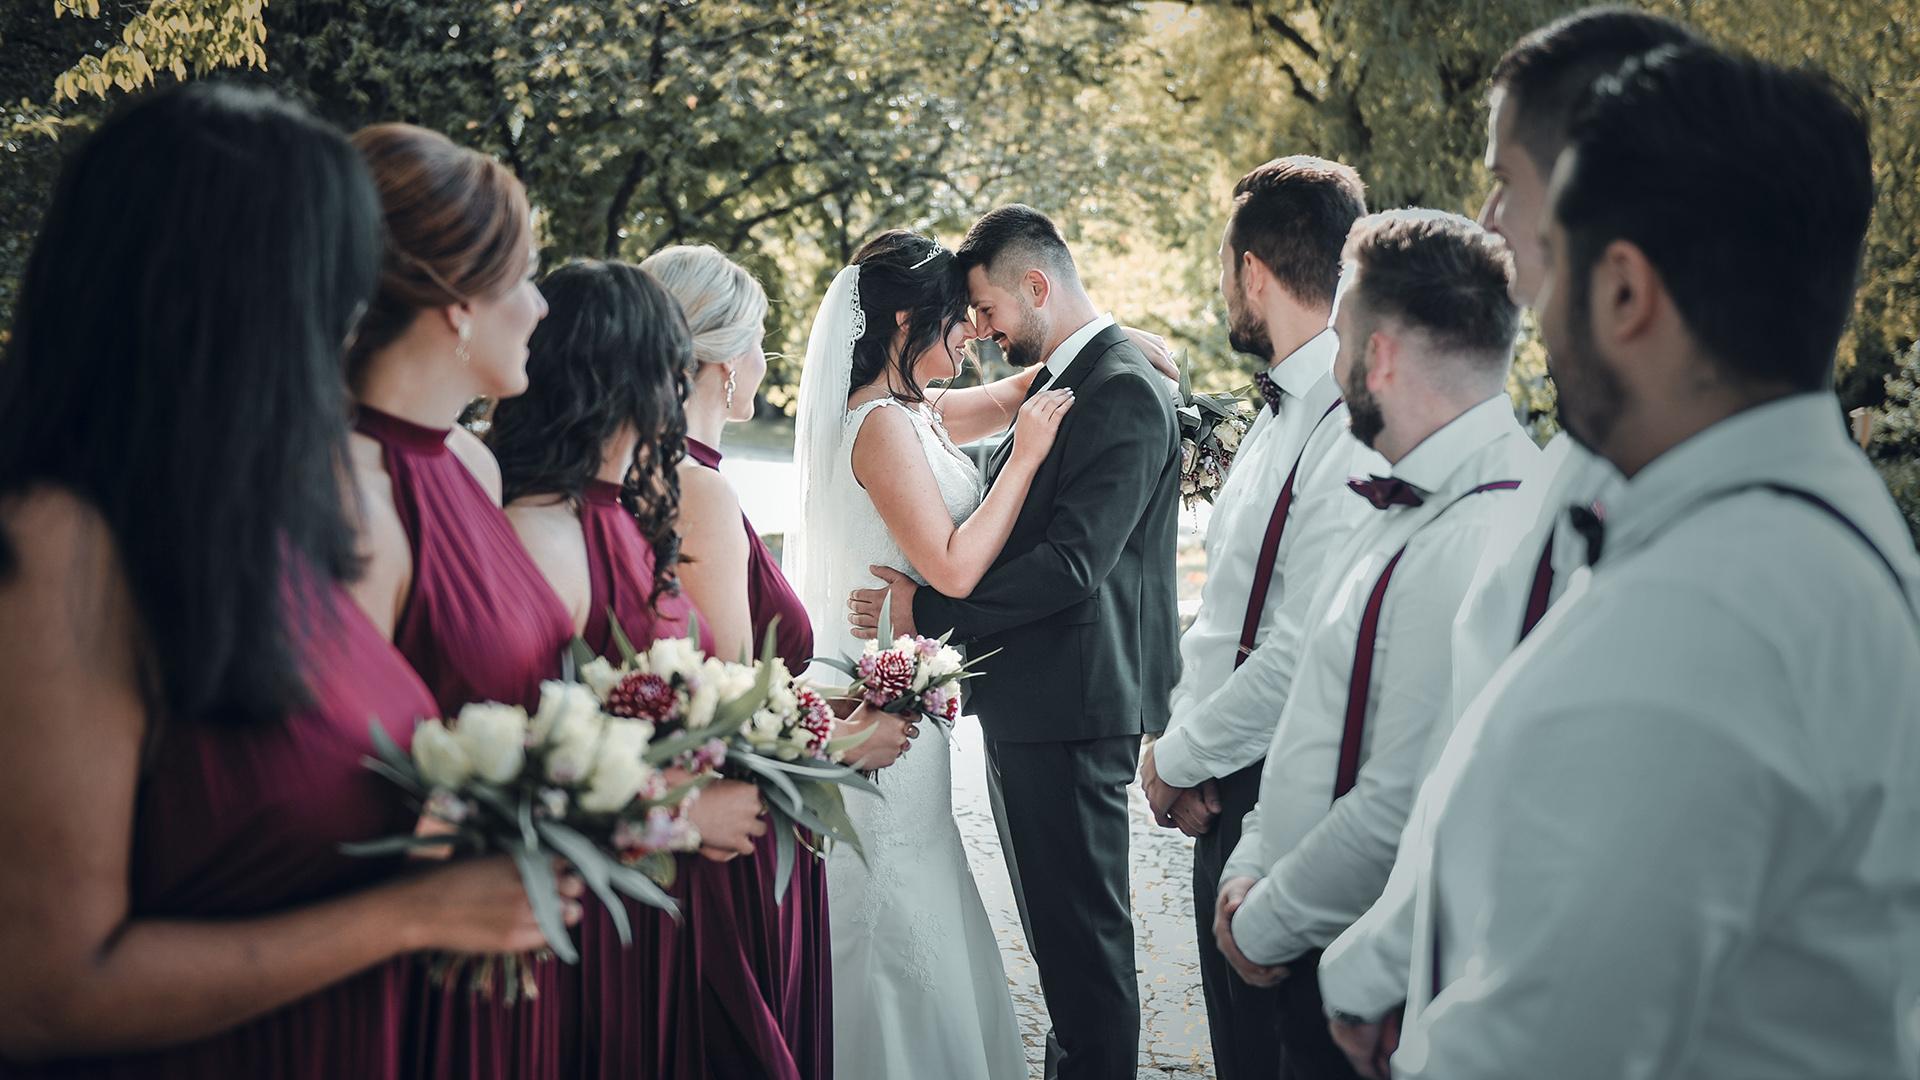 Fotografisanje-vencanja-Wedding-Photography-Hochzeitsfotografie-23